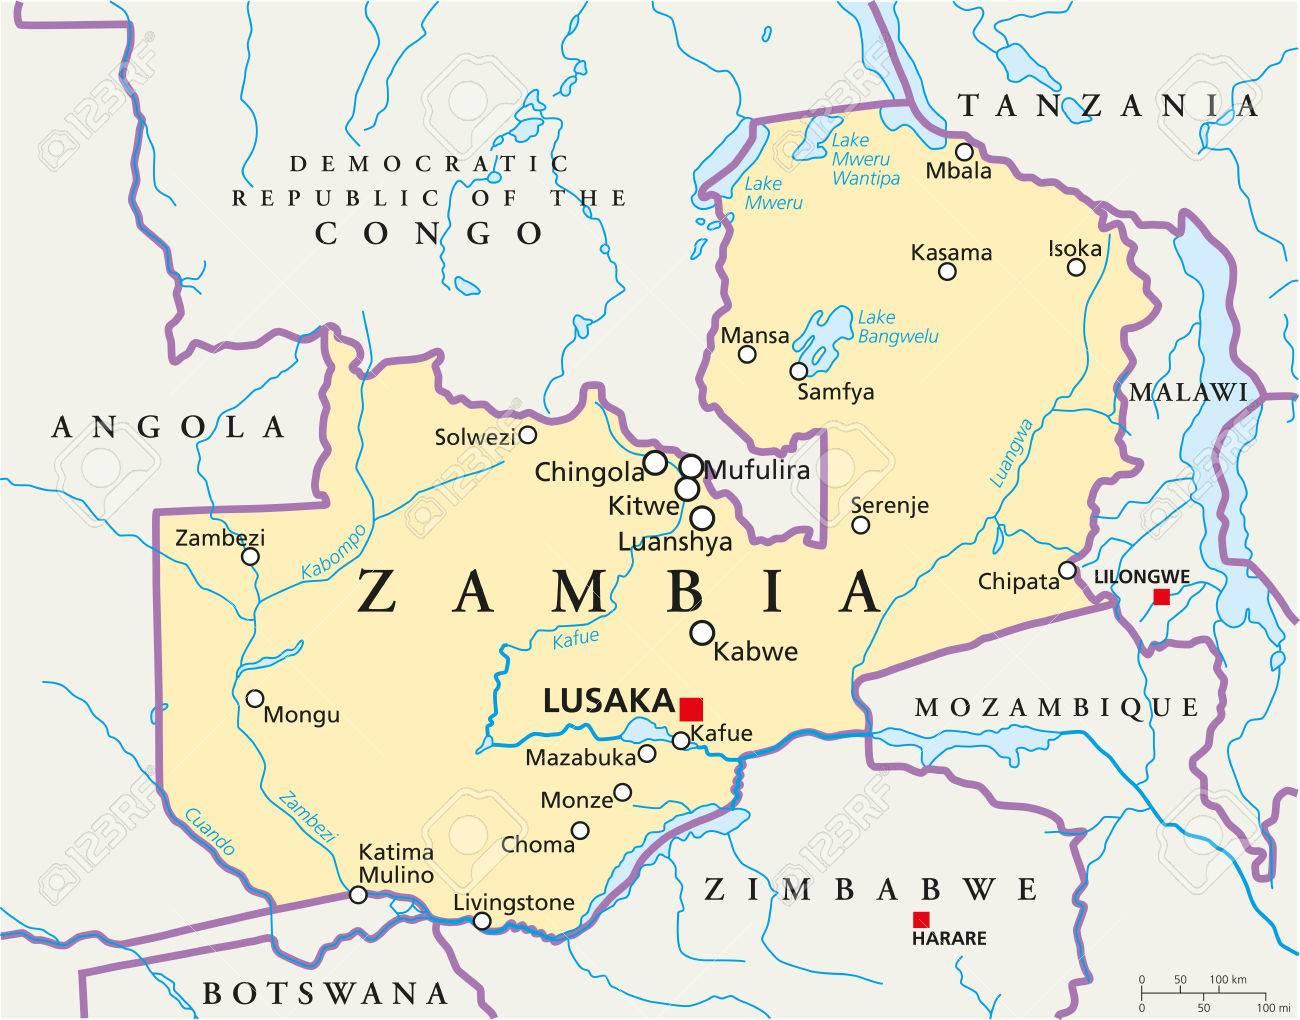 Map Zambia.Zambia Political Map With Capital Lusaka National Borders Most